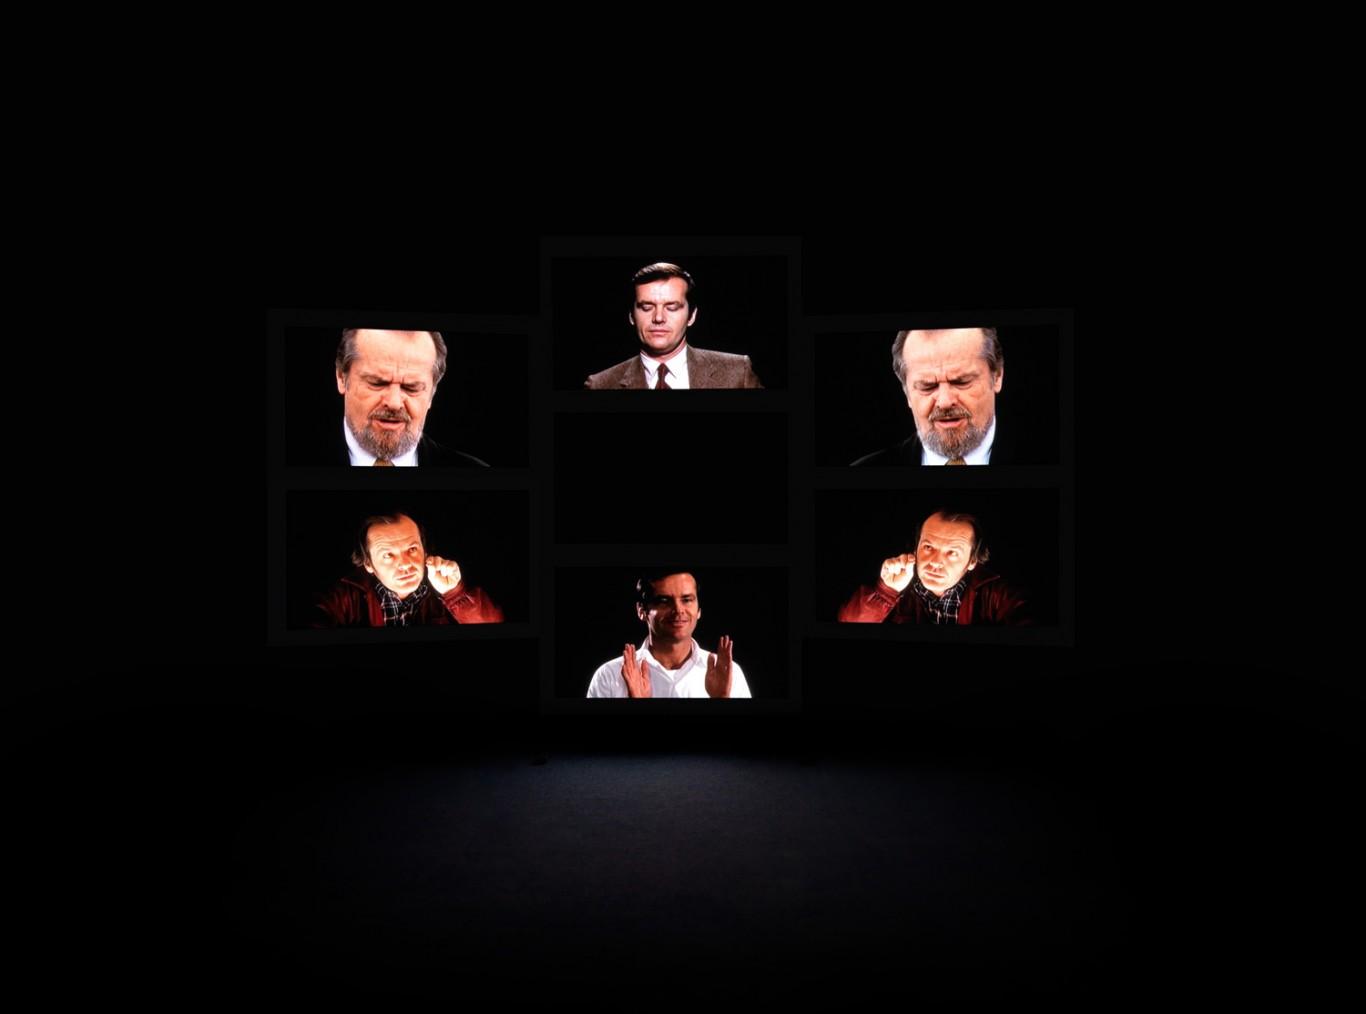 Candice Breitz, Him,1968-2008. Seven-Channel installation, duration: 28 min, 49 sec. Courtesy Goodman Gallery